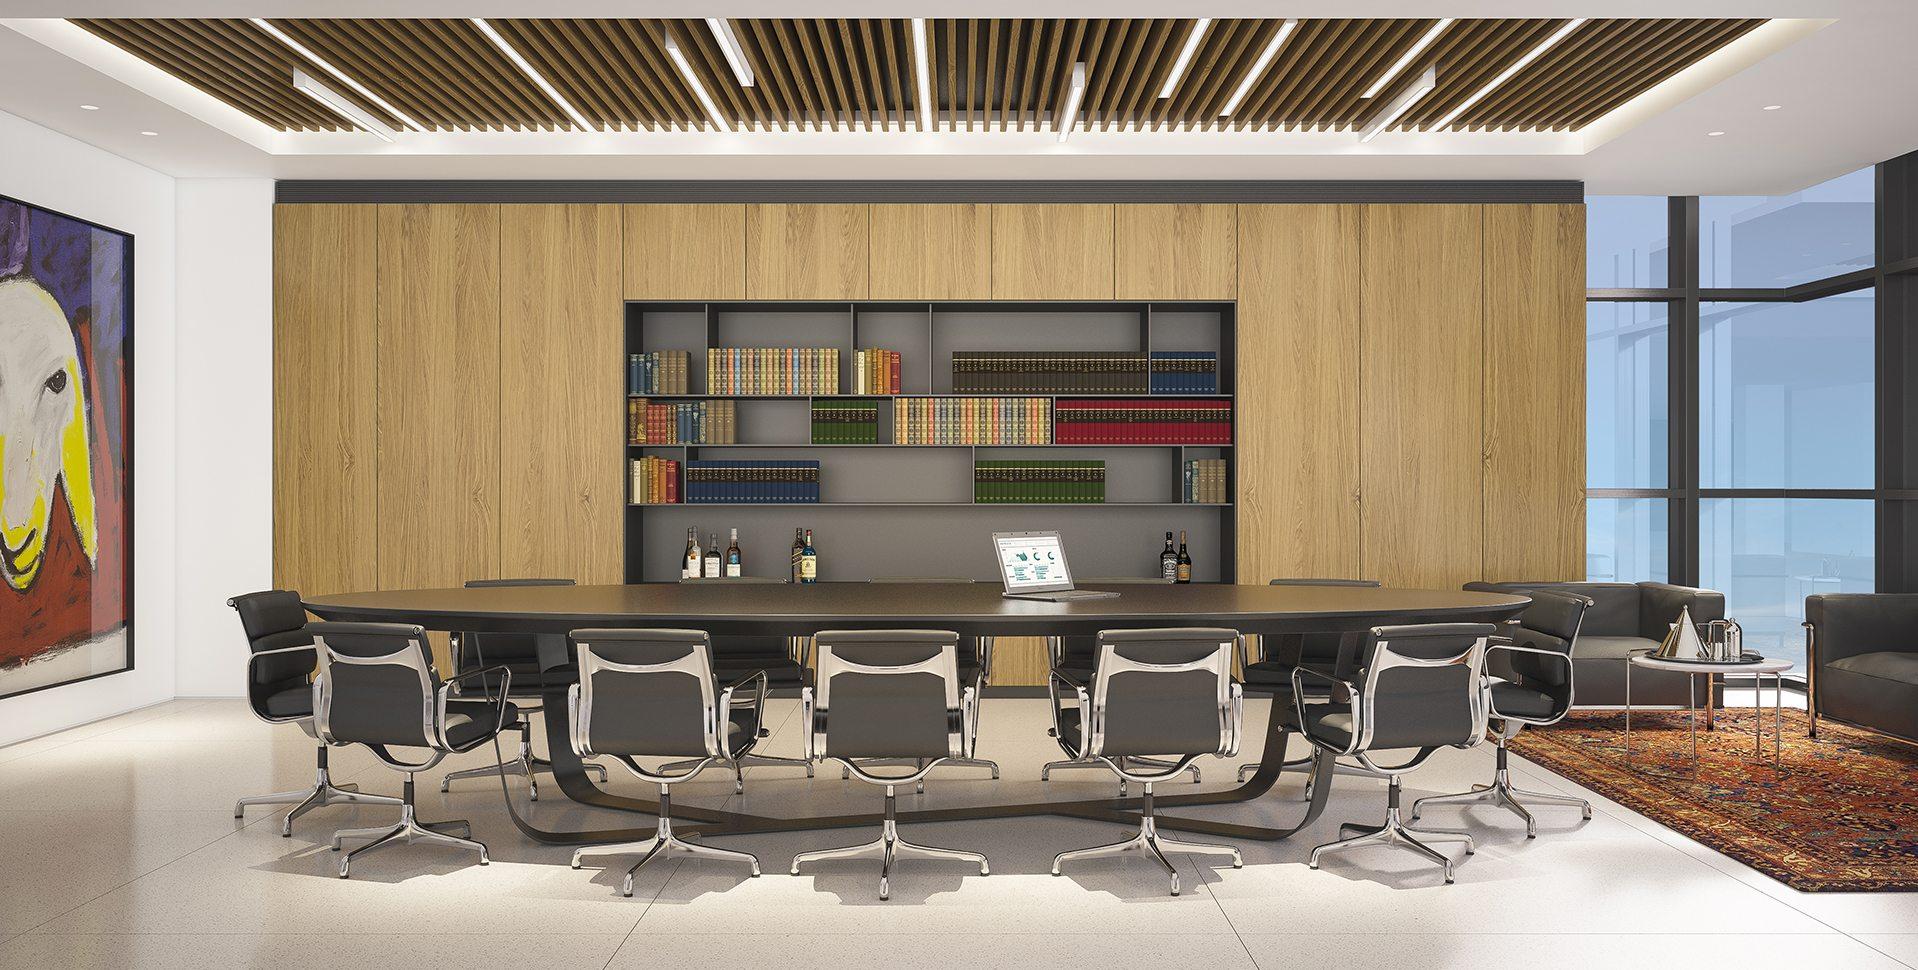 Architectural Visualization: Meeting Room Interior Design